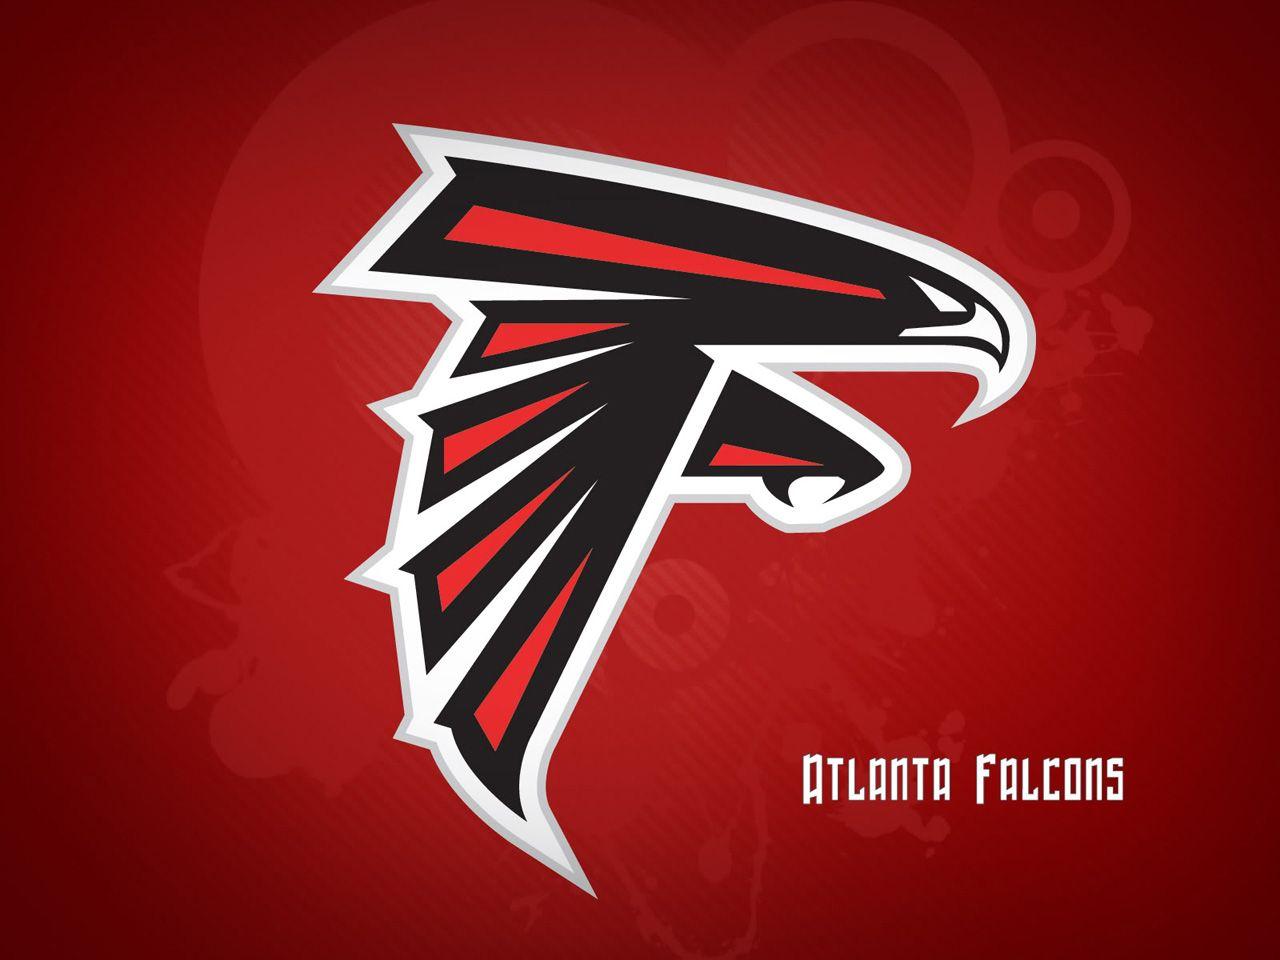 Picture Of Atlanta Falcons Atlanta Falcons Atlanta Falcons Logo Falcons